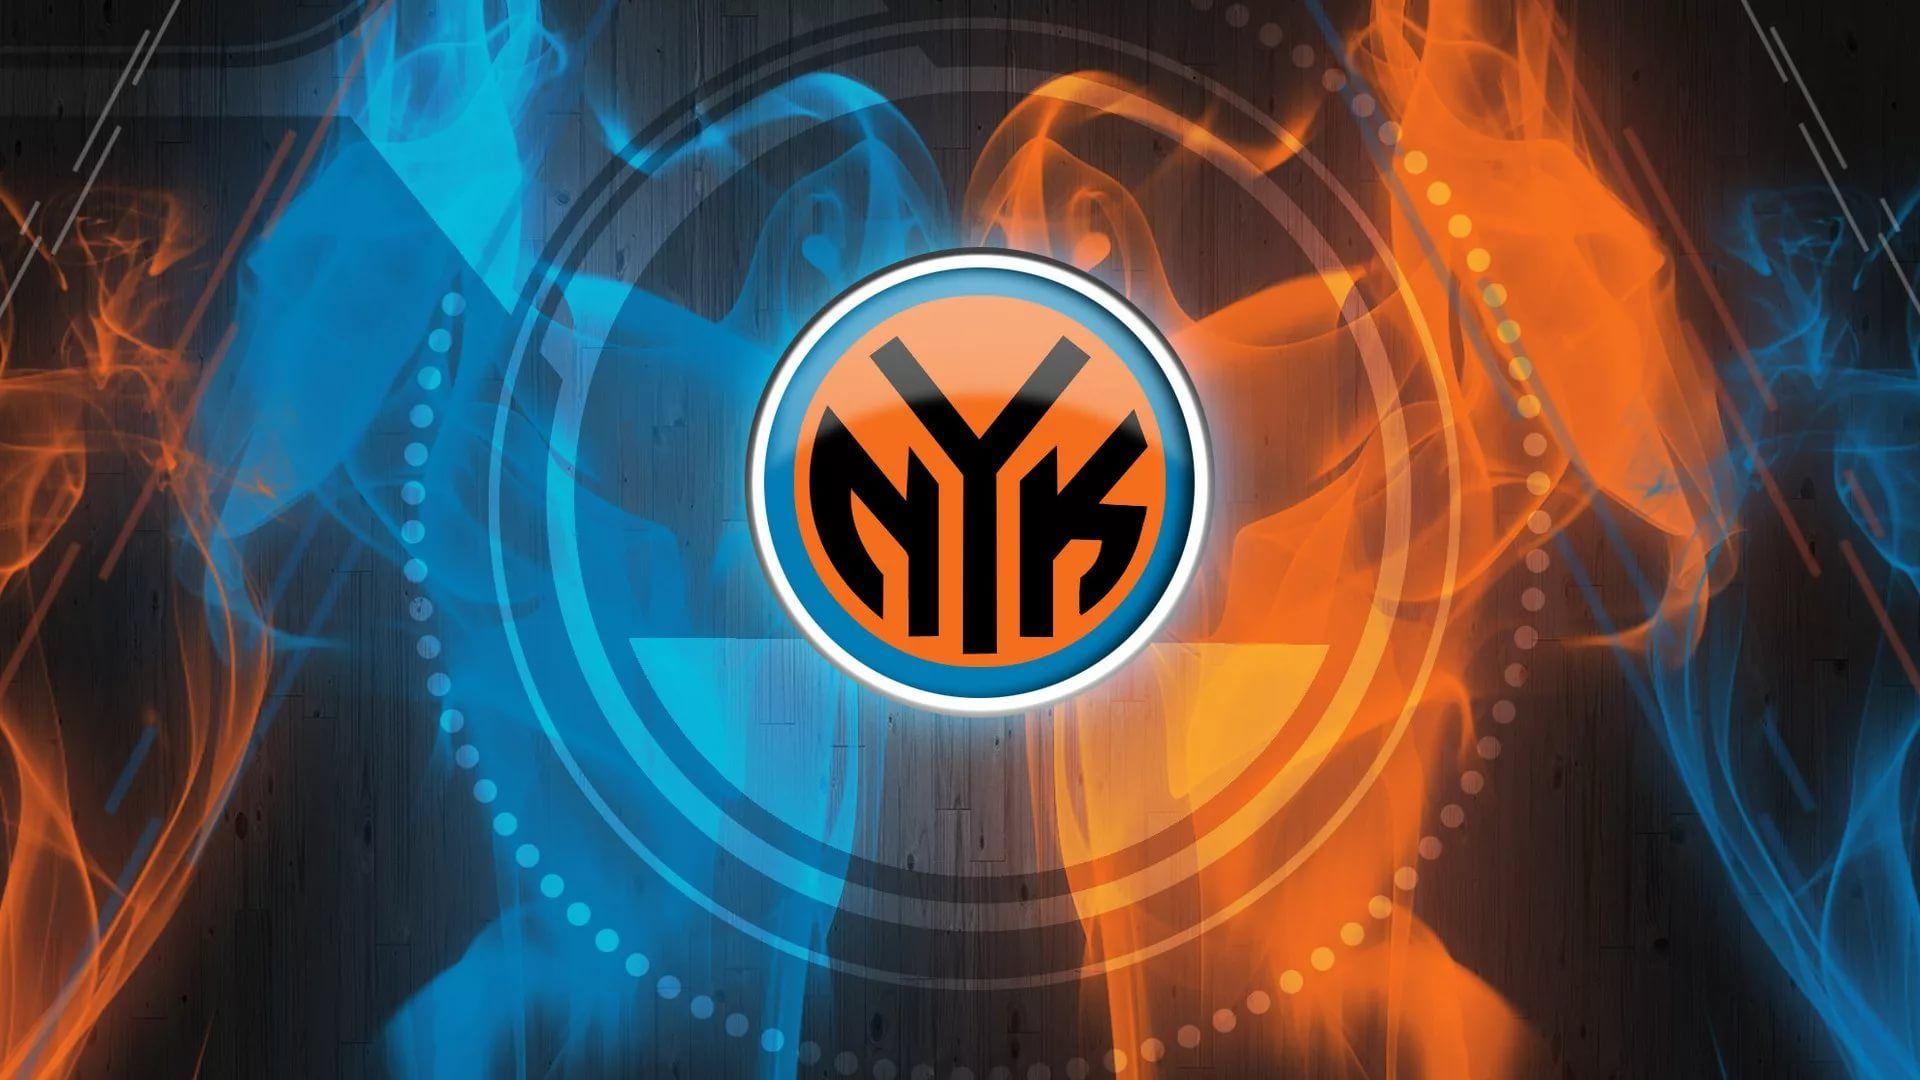 New York Knicks download wallpaper image